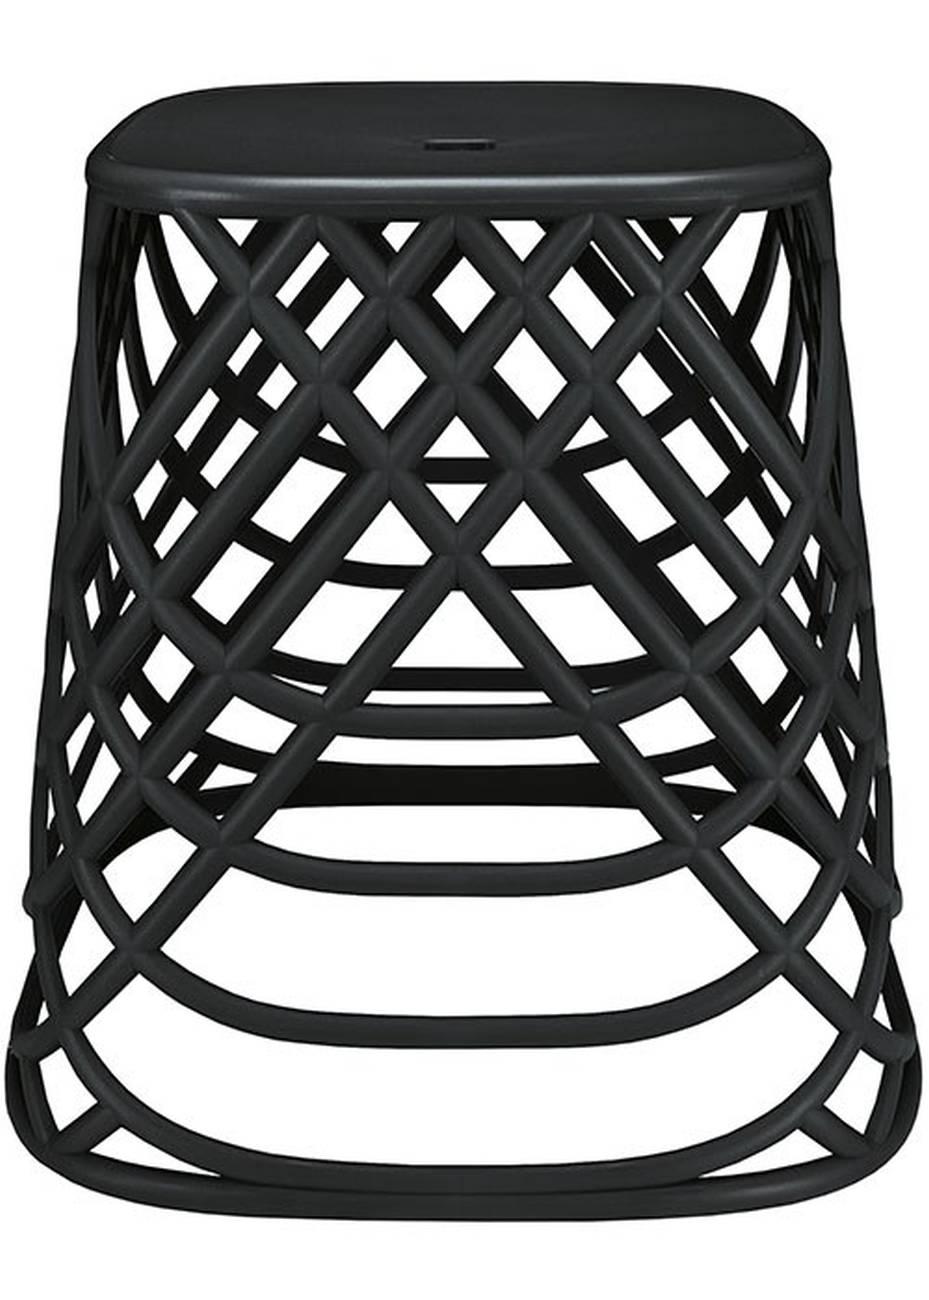 Hocker Scandic Chair Polypropylen Schwarz 43,5x43x43,5cm BxHxT